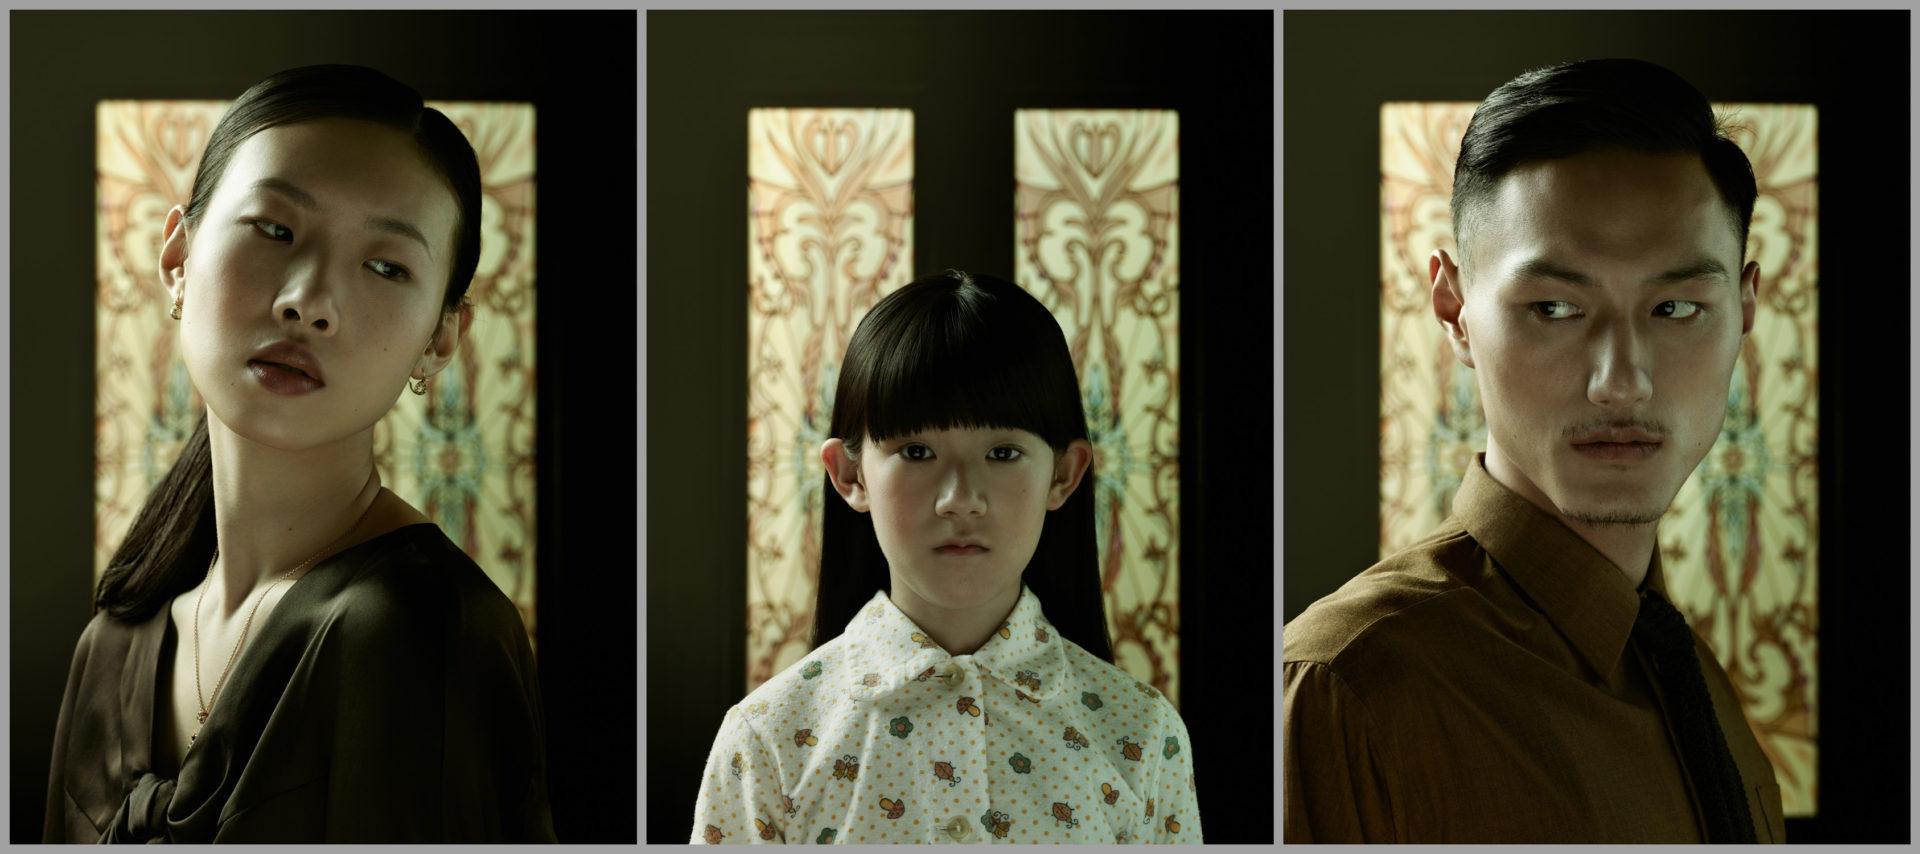 Shanghai_Fu1088_The trinity_2017